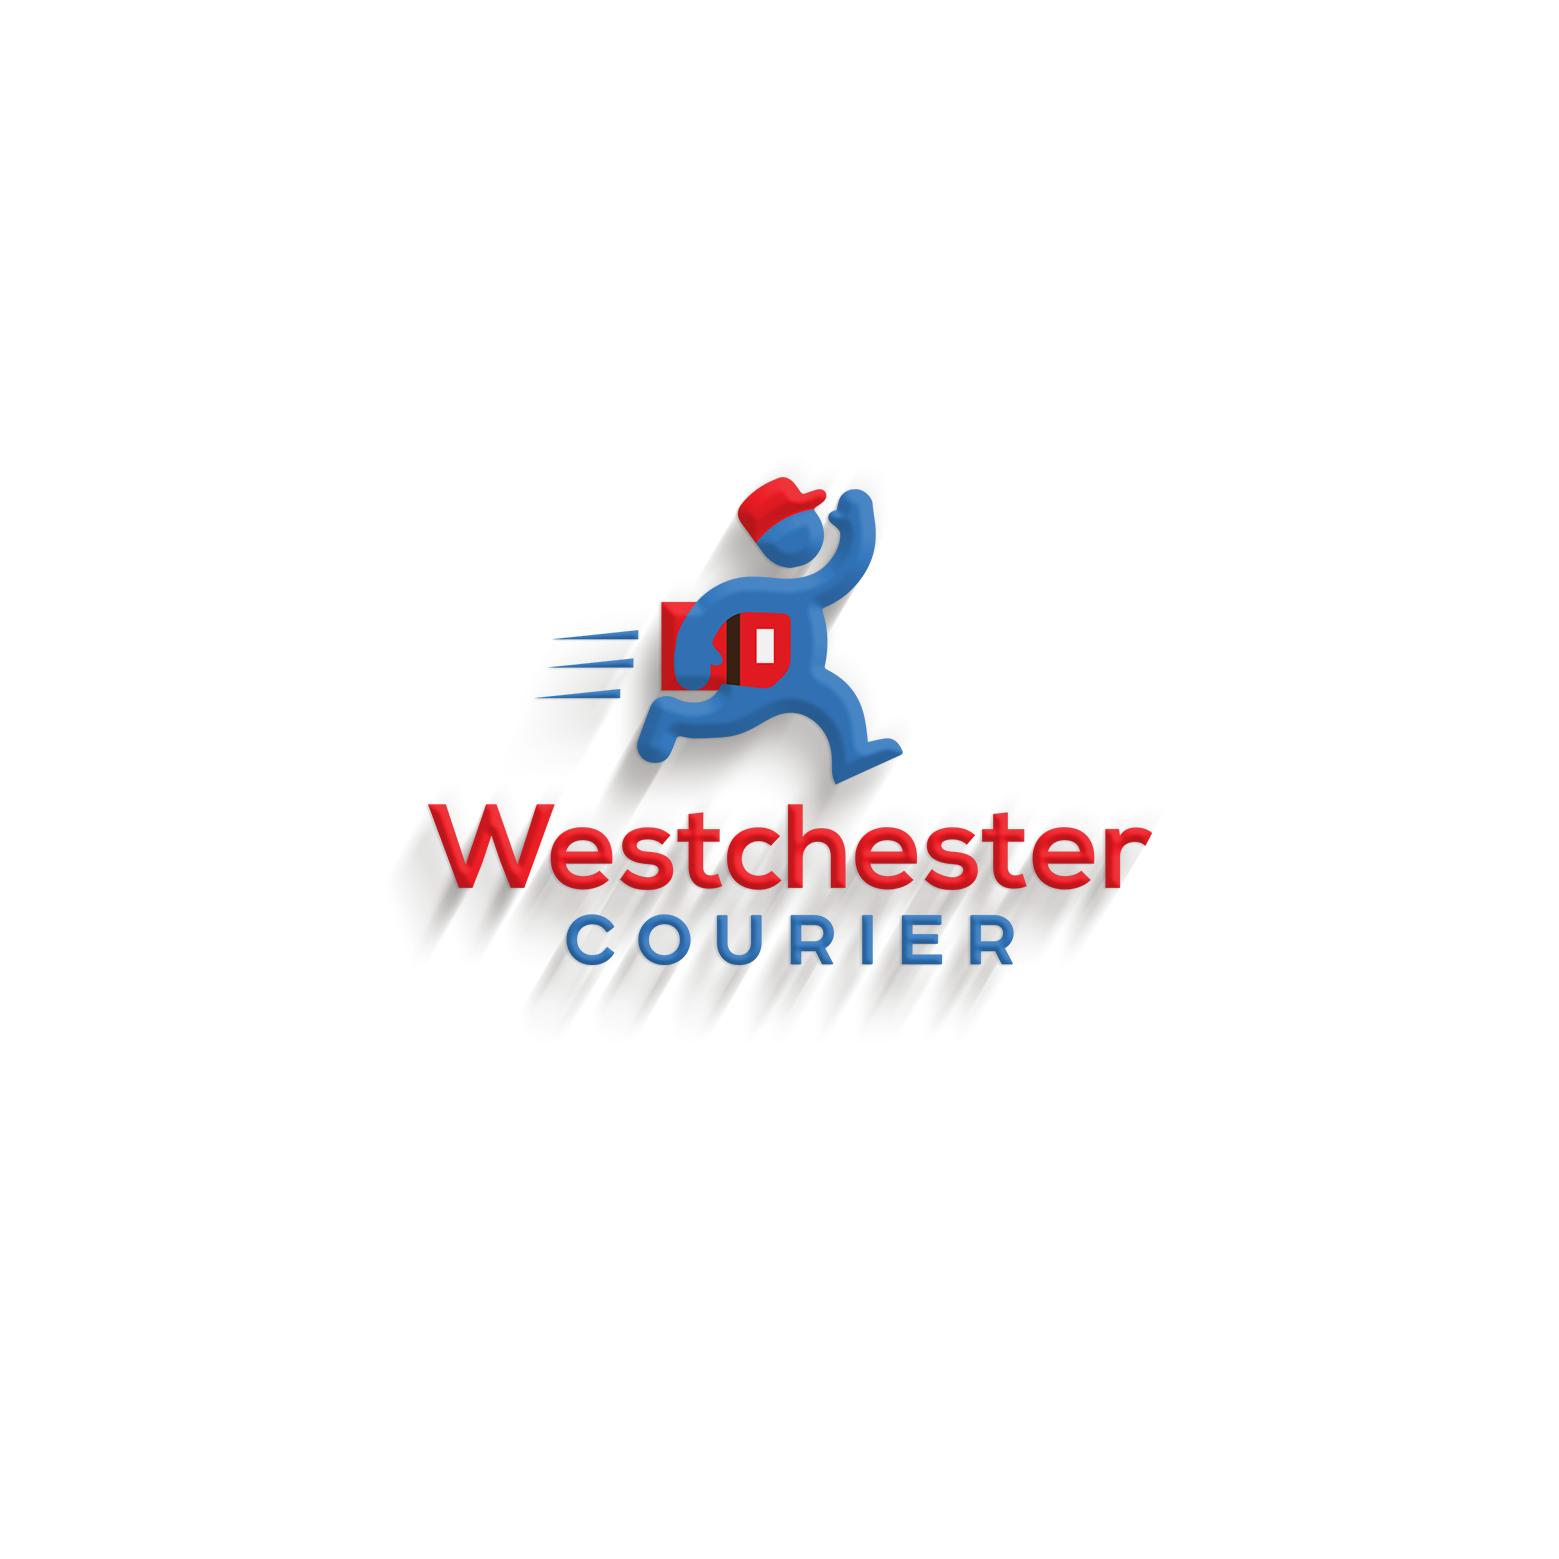 Westchester Courier